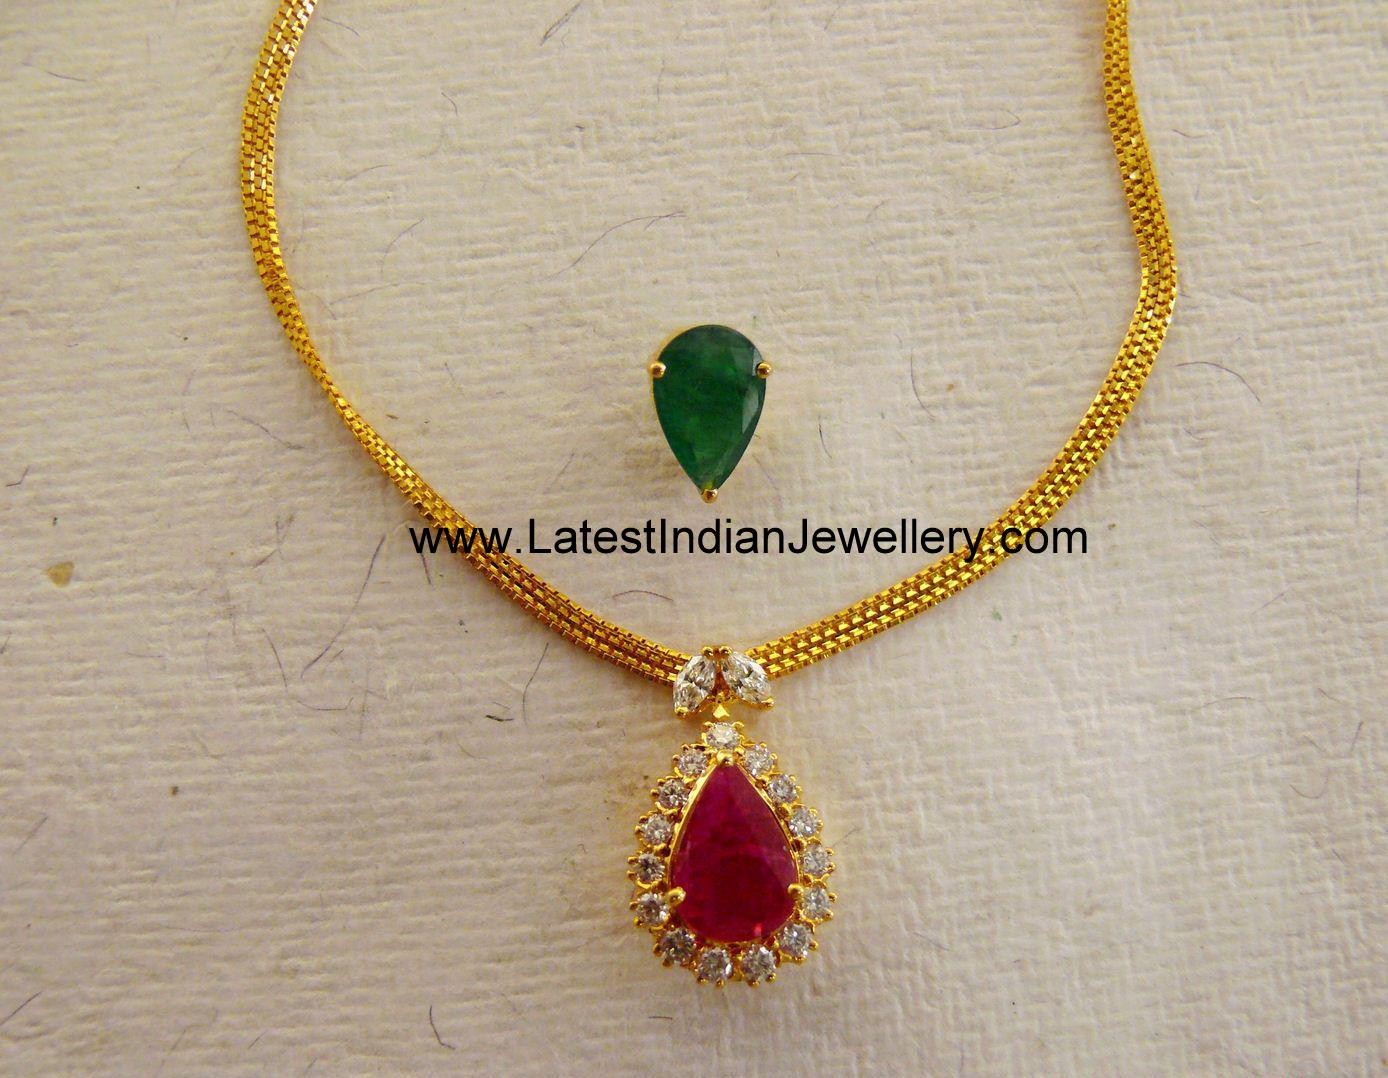 Simple Elegant Necklace with Interchangeable Gemstone Pendant